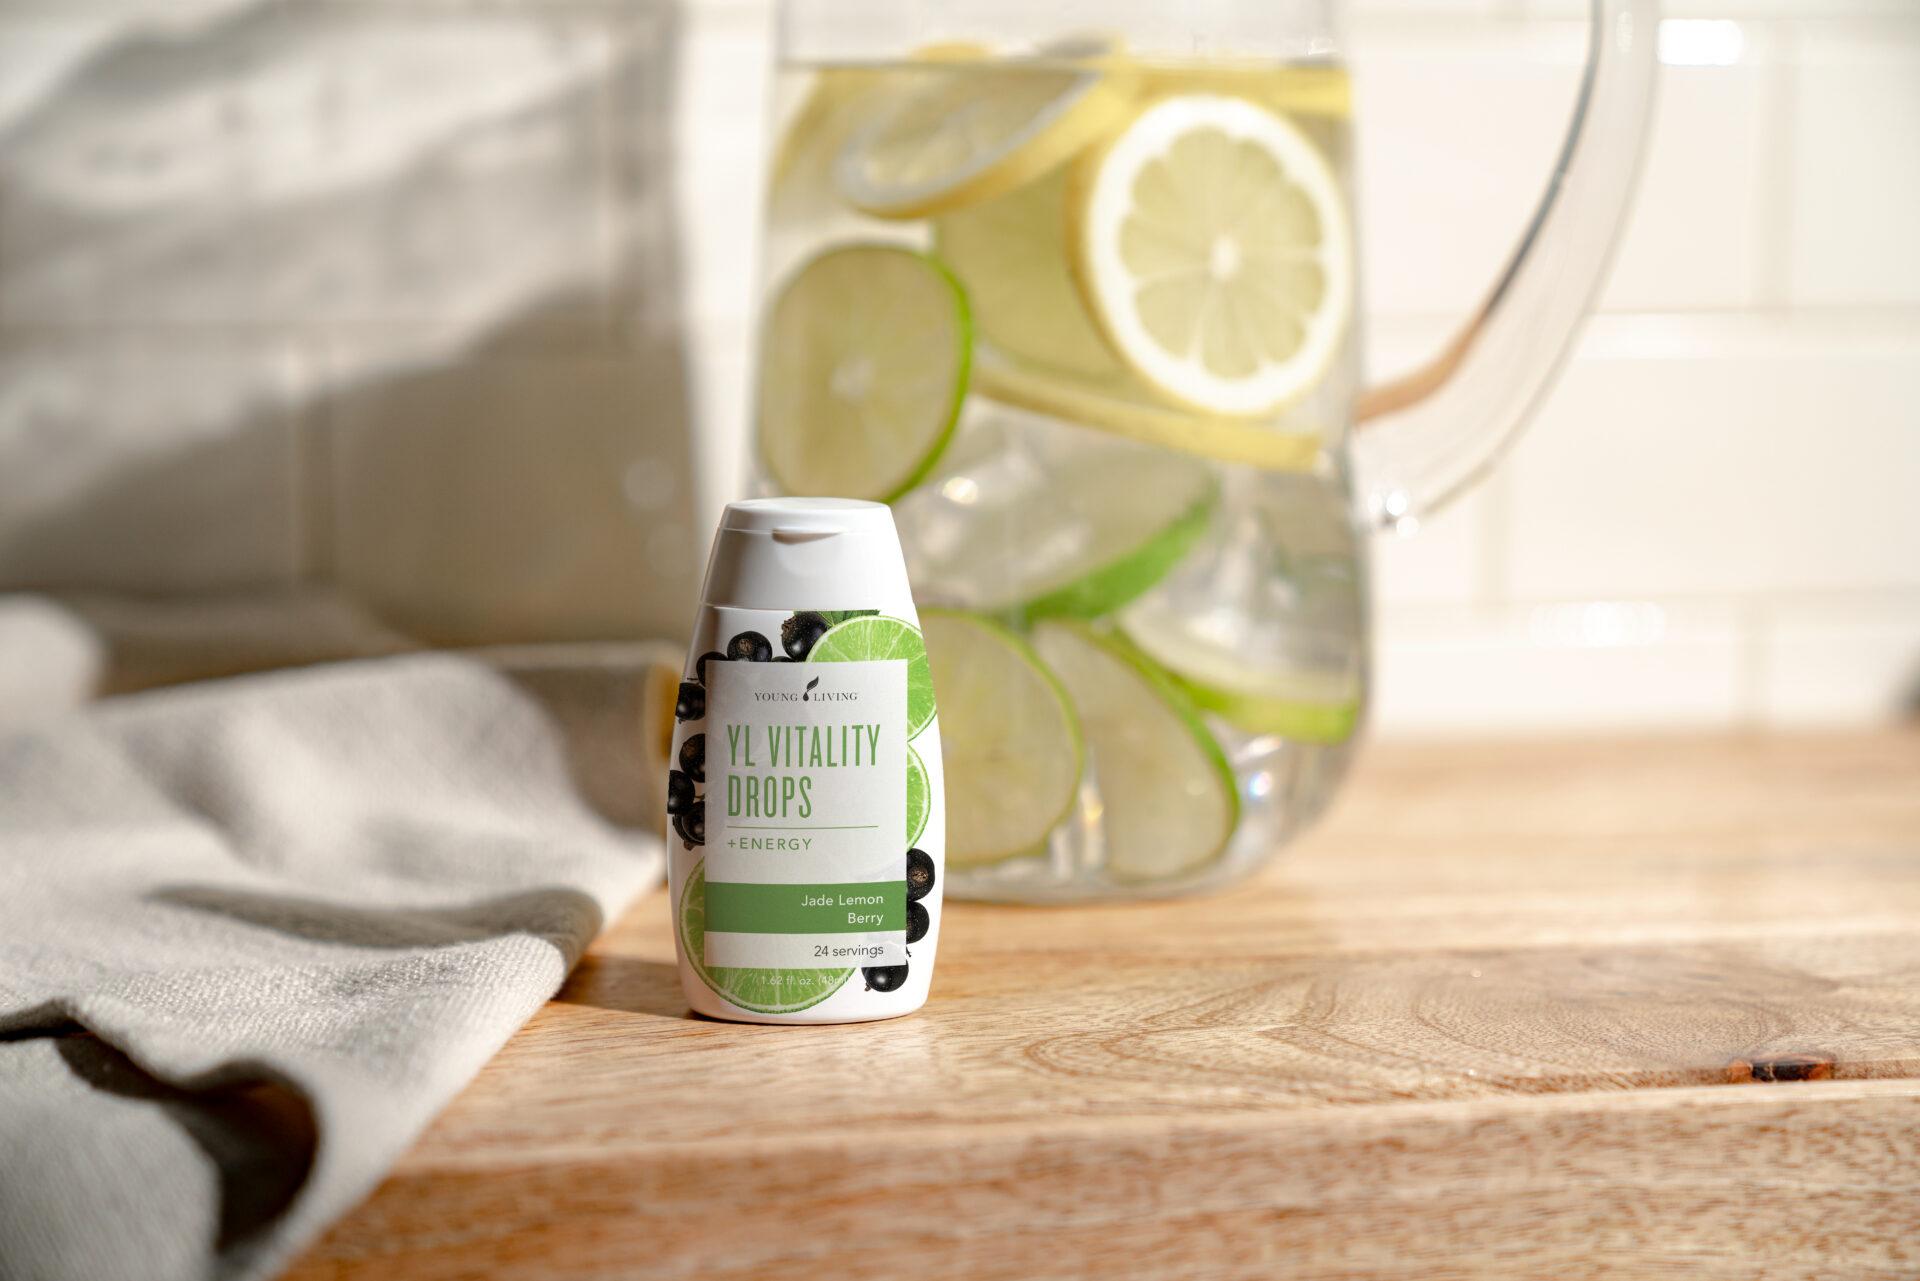 YL Vitality Drops - Energy Jade Lemon Berry - Young Living Essential Oils